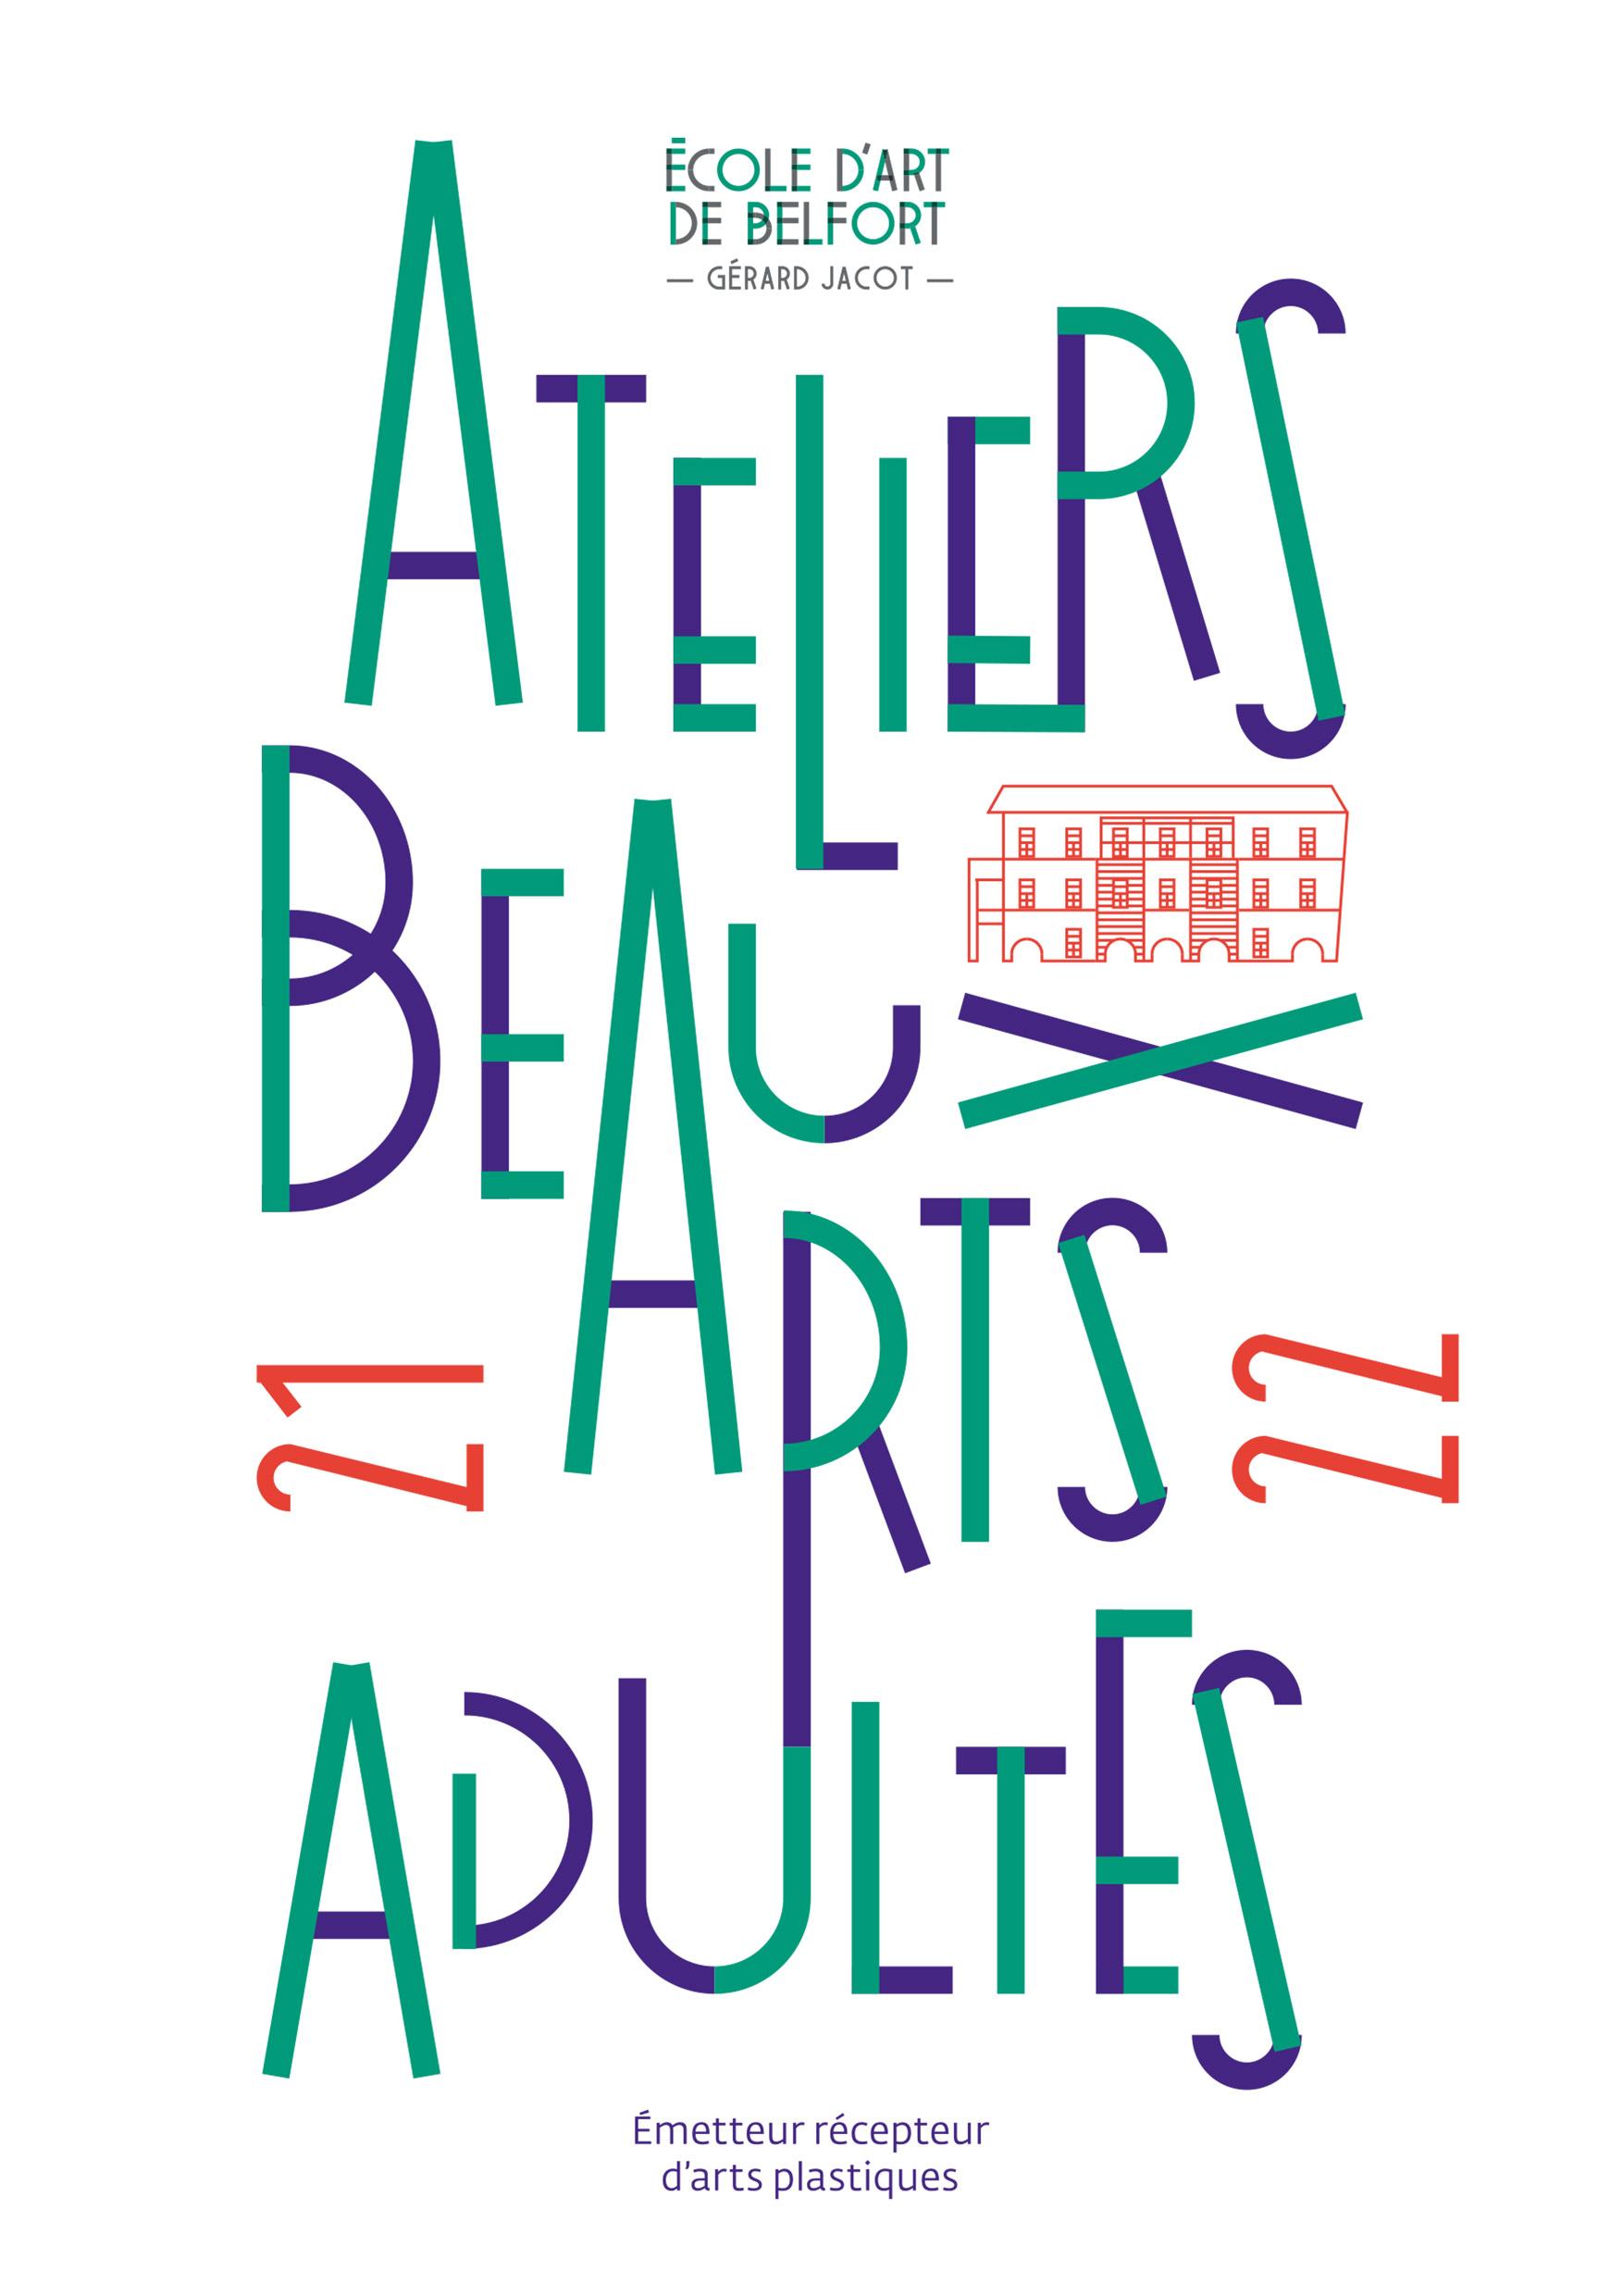 brochure-atelier-adulte